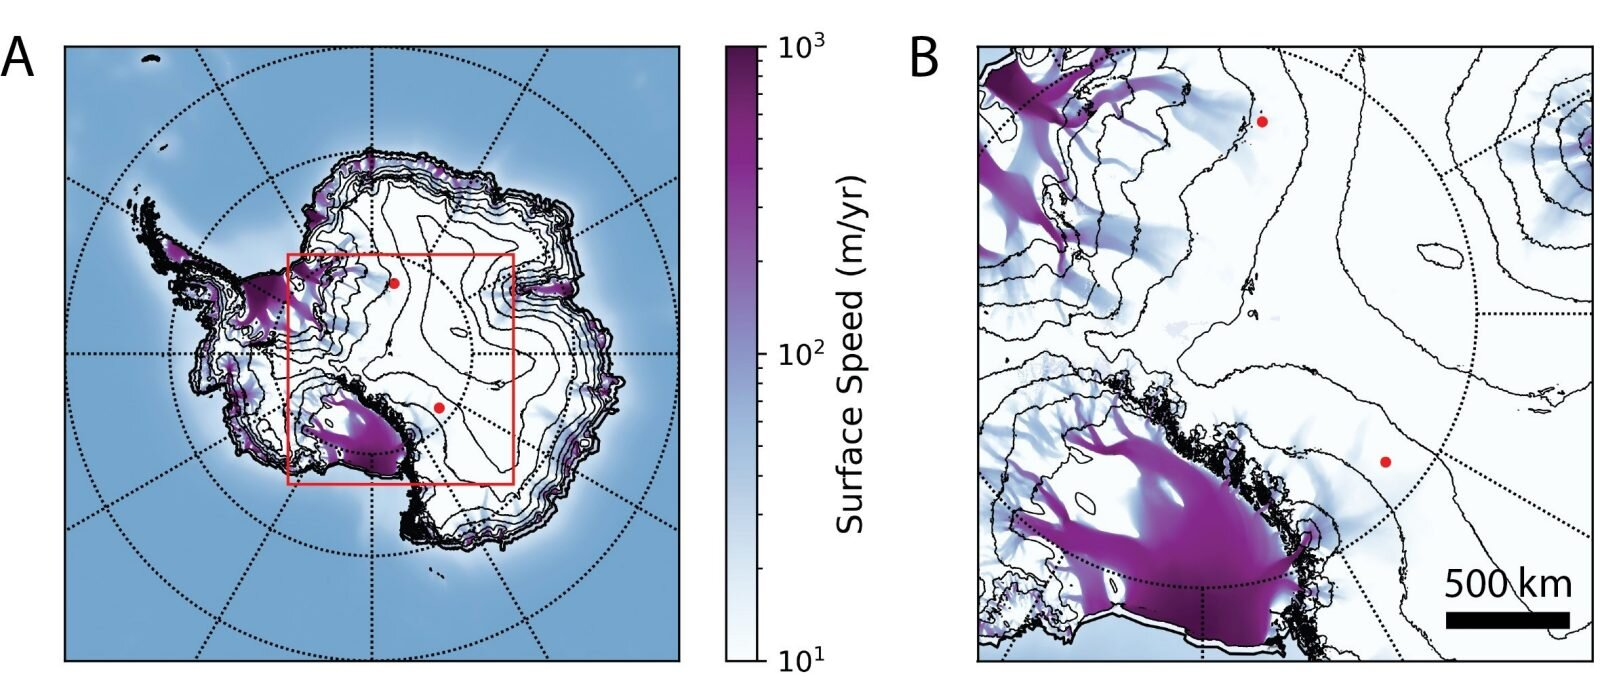 Поток нейтрино в антарктиде